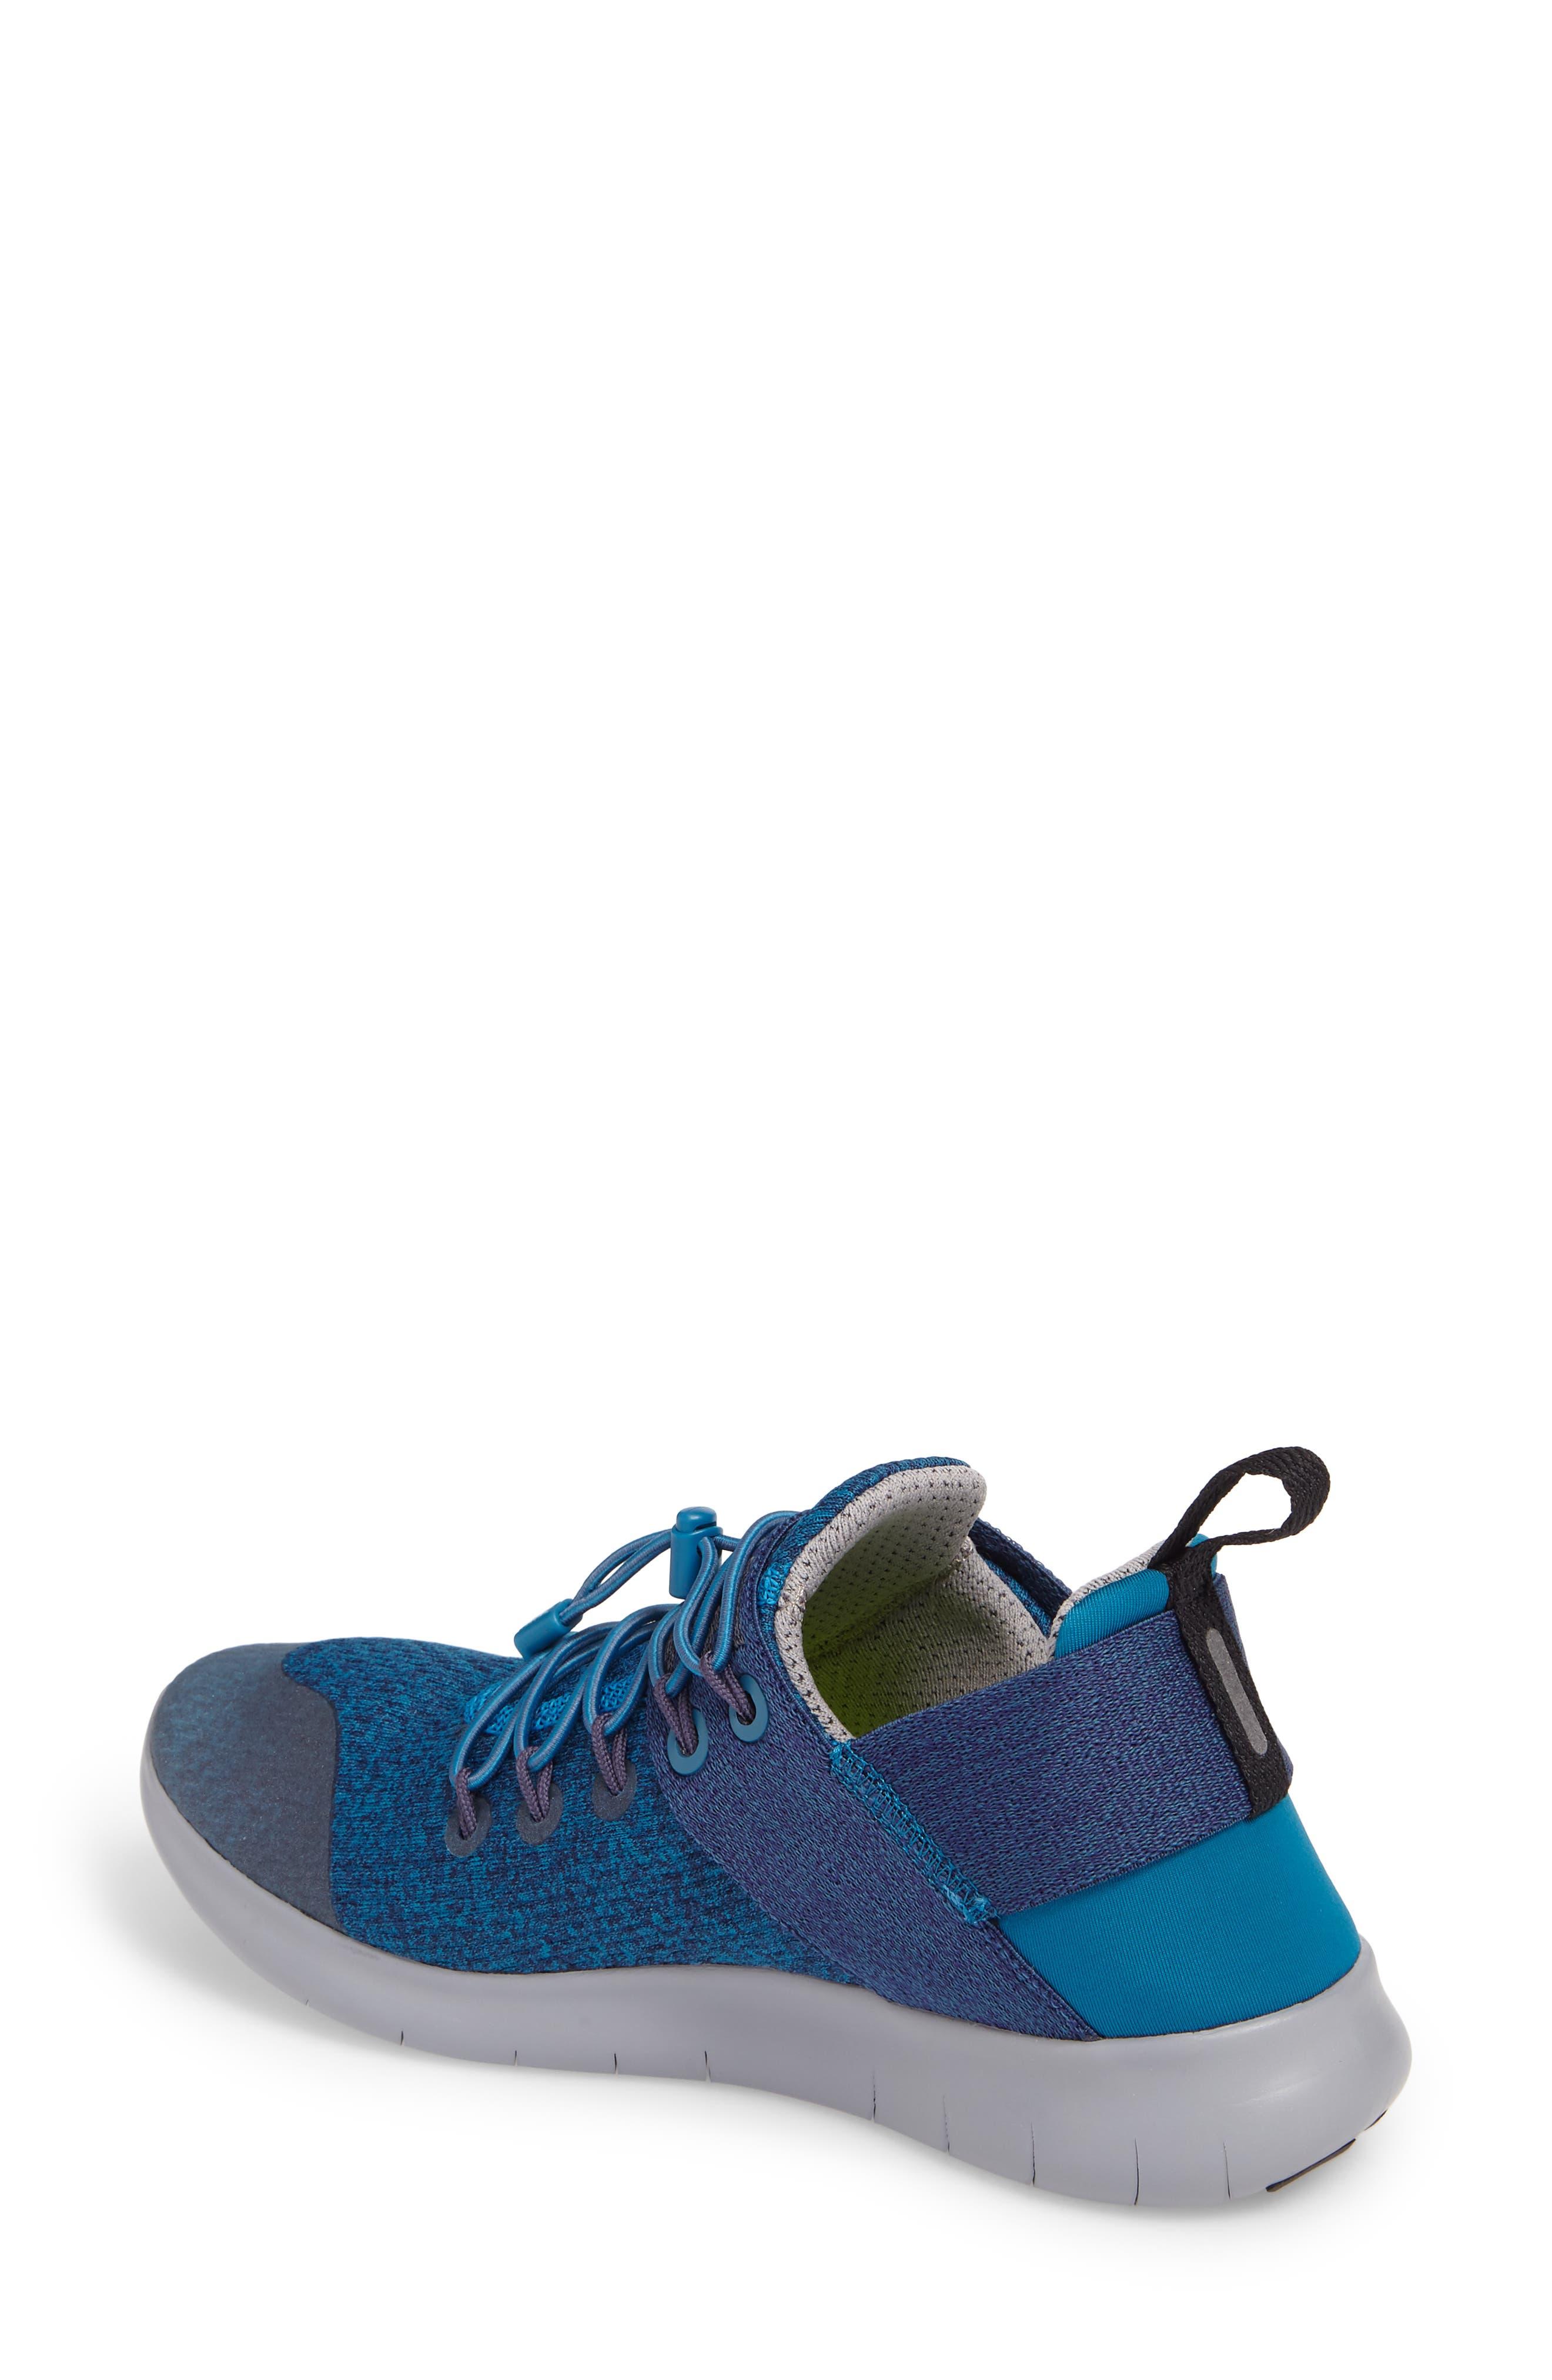 Free RN Commuter 2017 Premium Running Shoe,                             Alternate thumbnail 6, color,